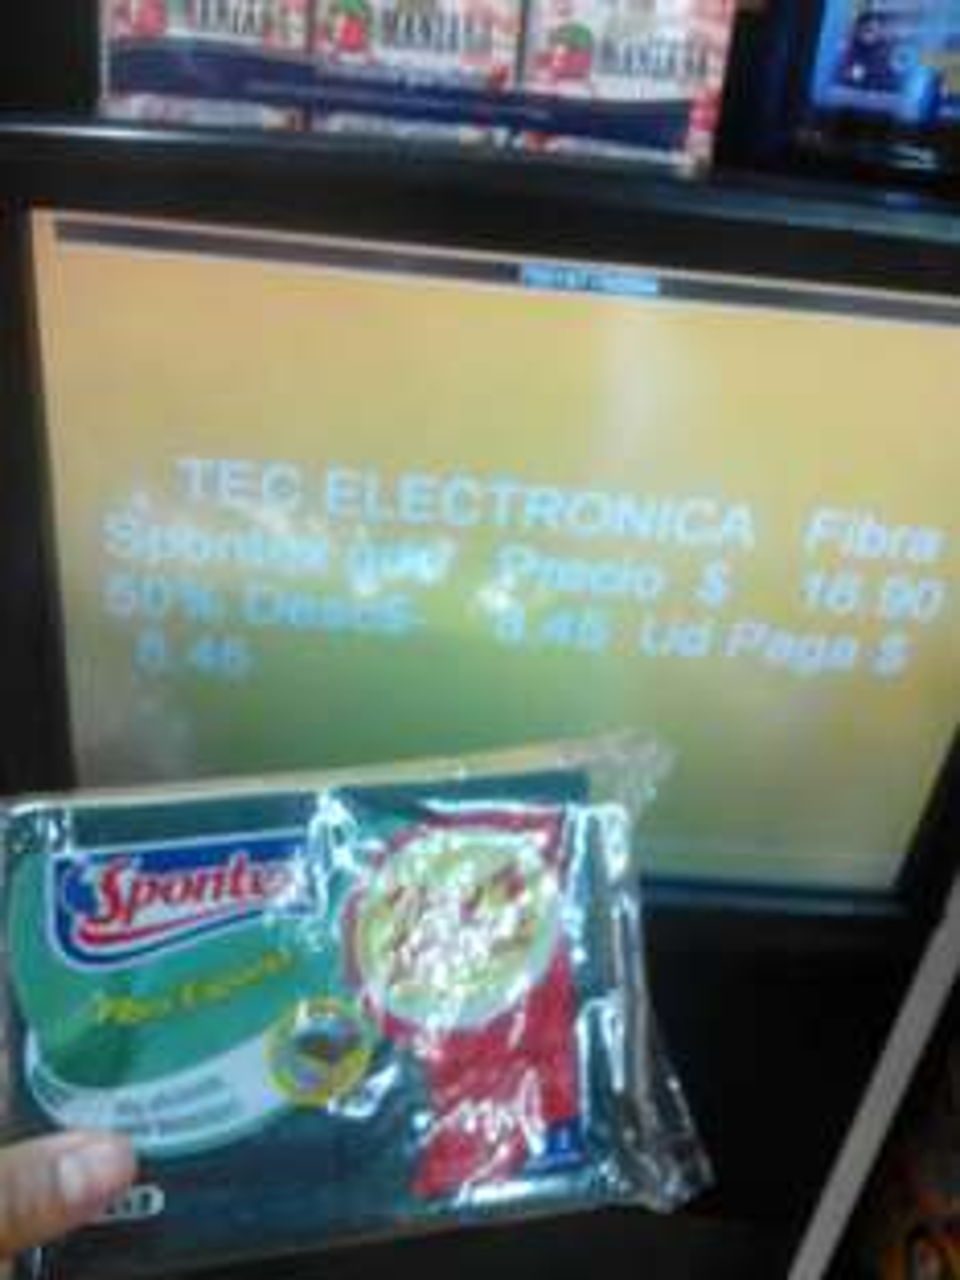 Chedraui Tampico Altamira: fibras para lavar trastes Spontex desde $2.50